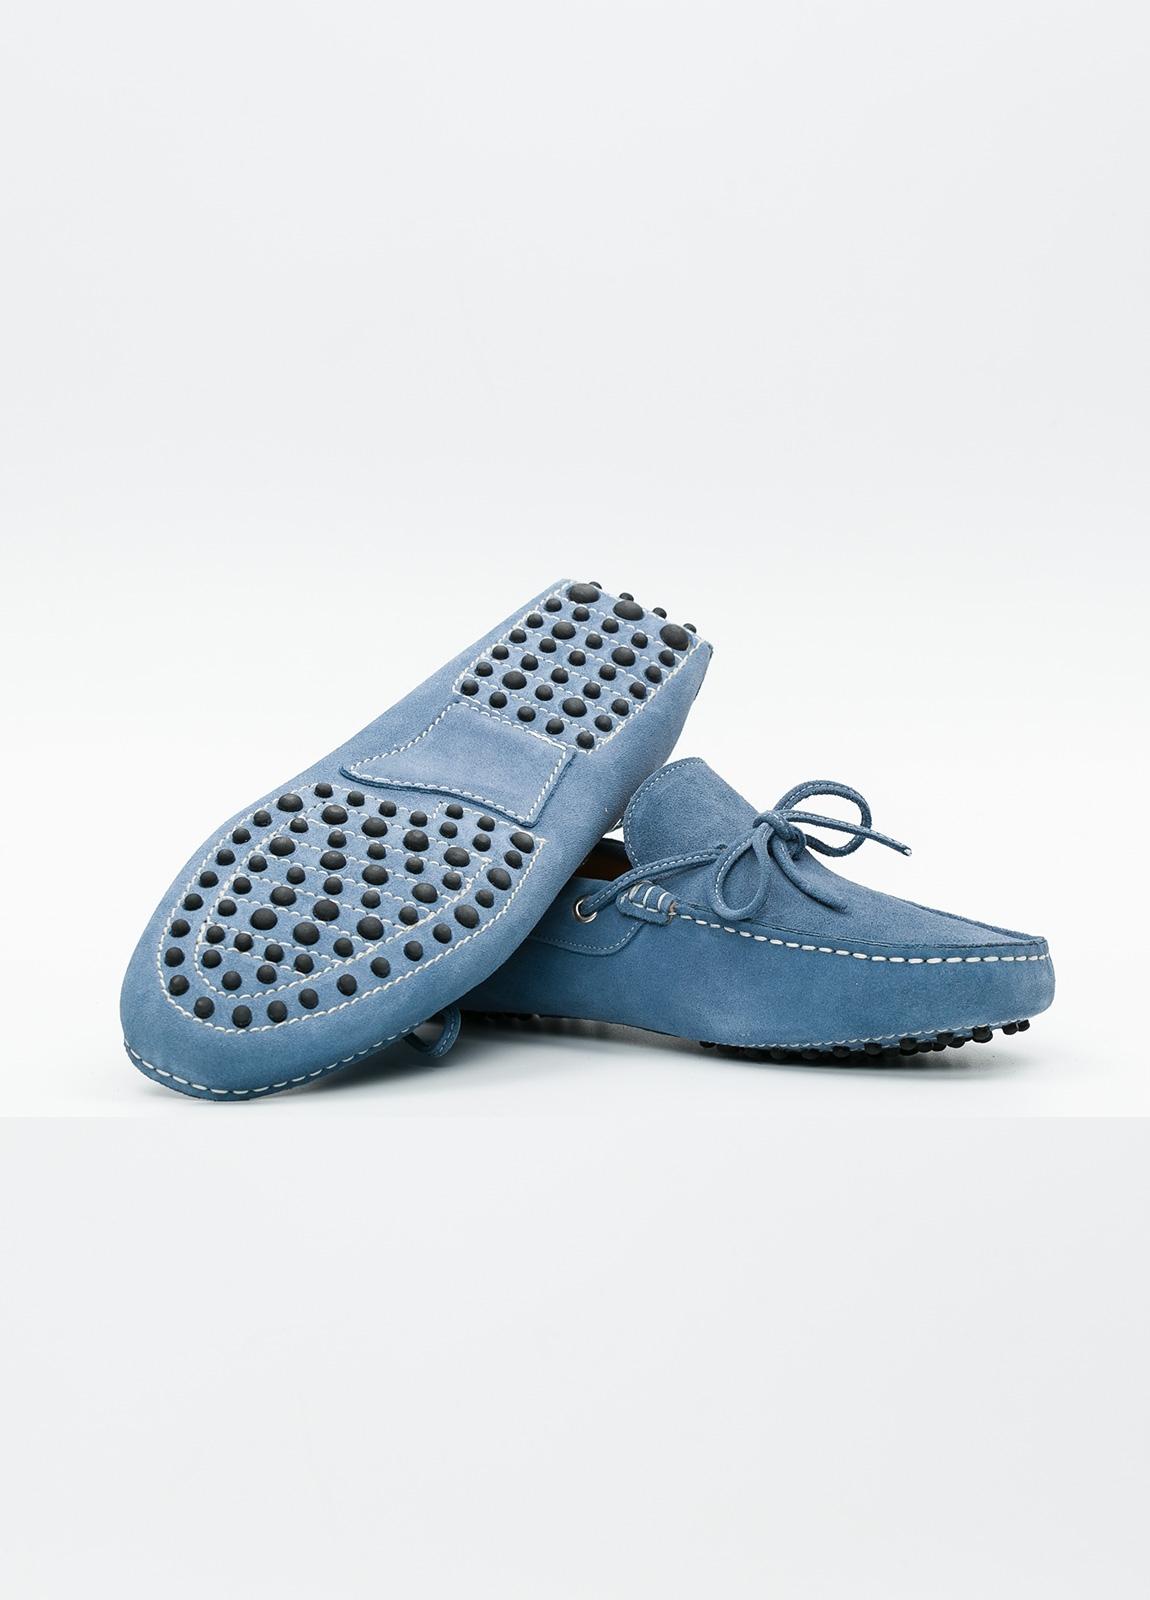 Zapato mocasín Sport color azul, 100% Piel. - Ítem1